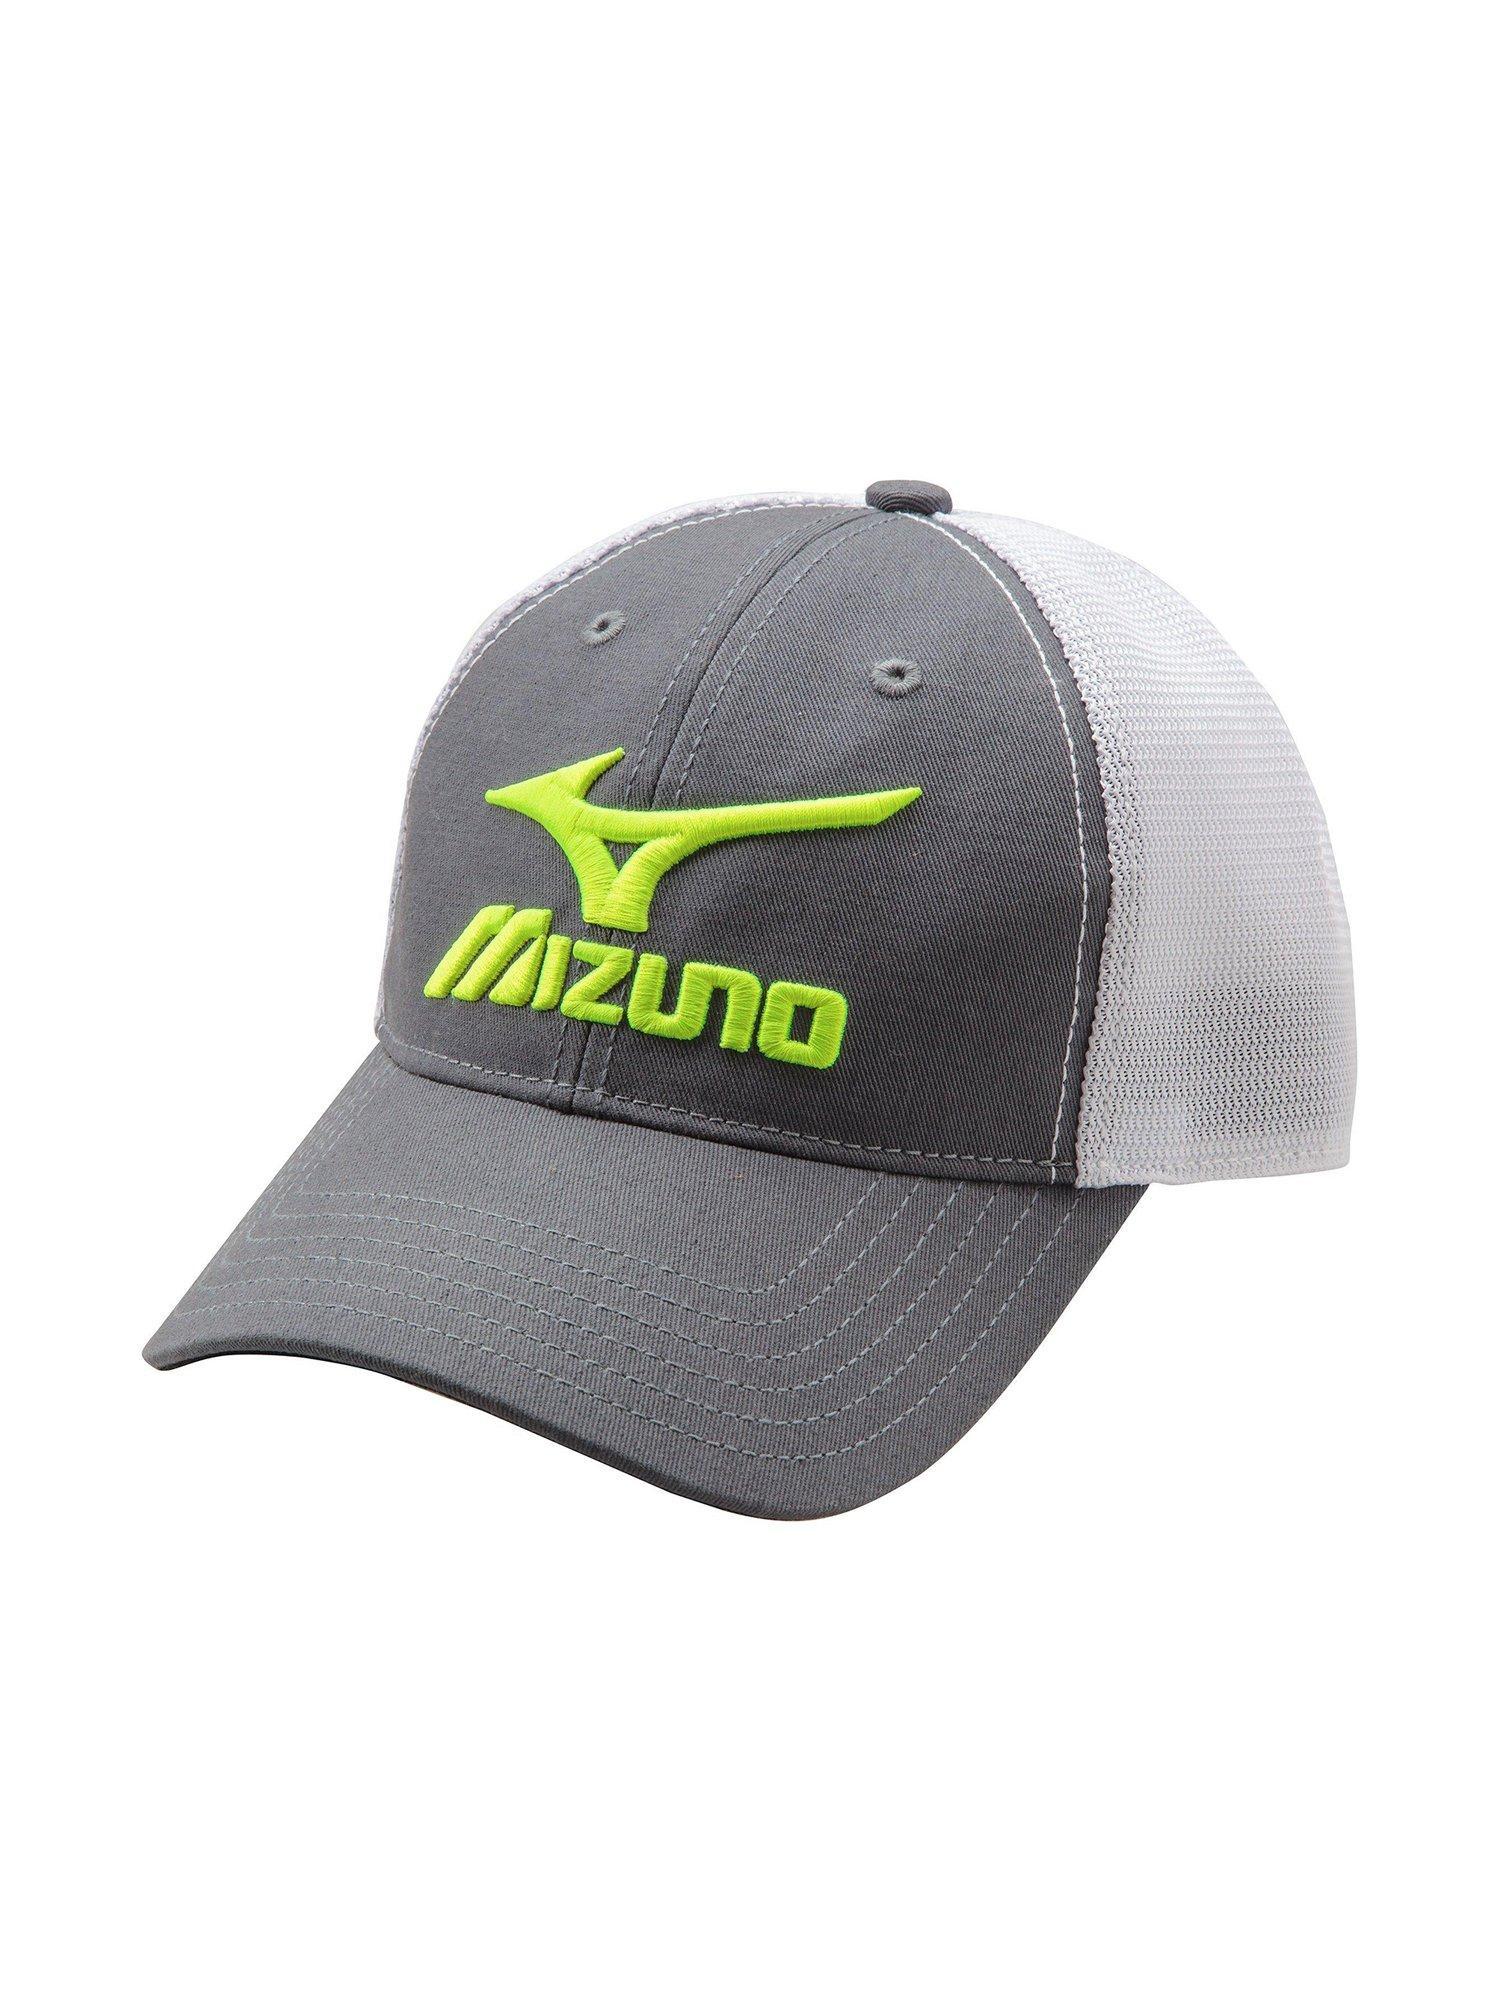 Image is loading Mizuno-Baseball-Accessories-Mizuno-Mesh-Trucker-Hat-370211 2fefa6cdfe9